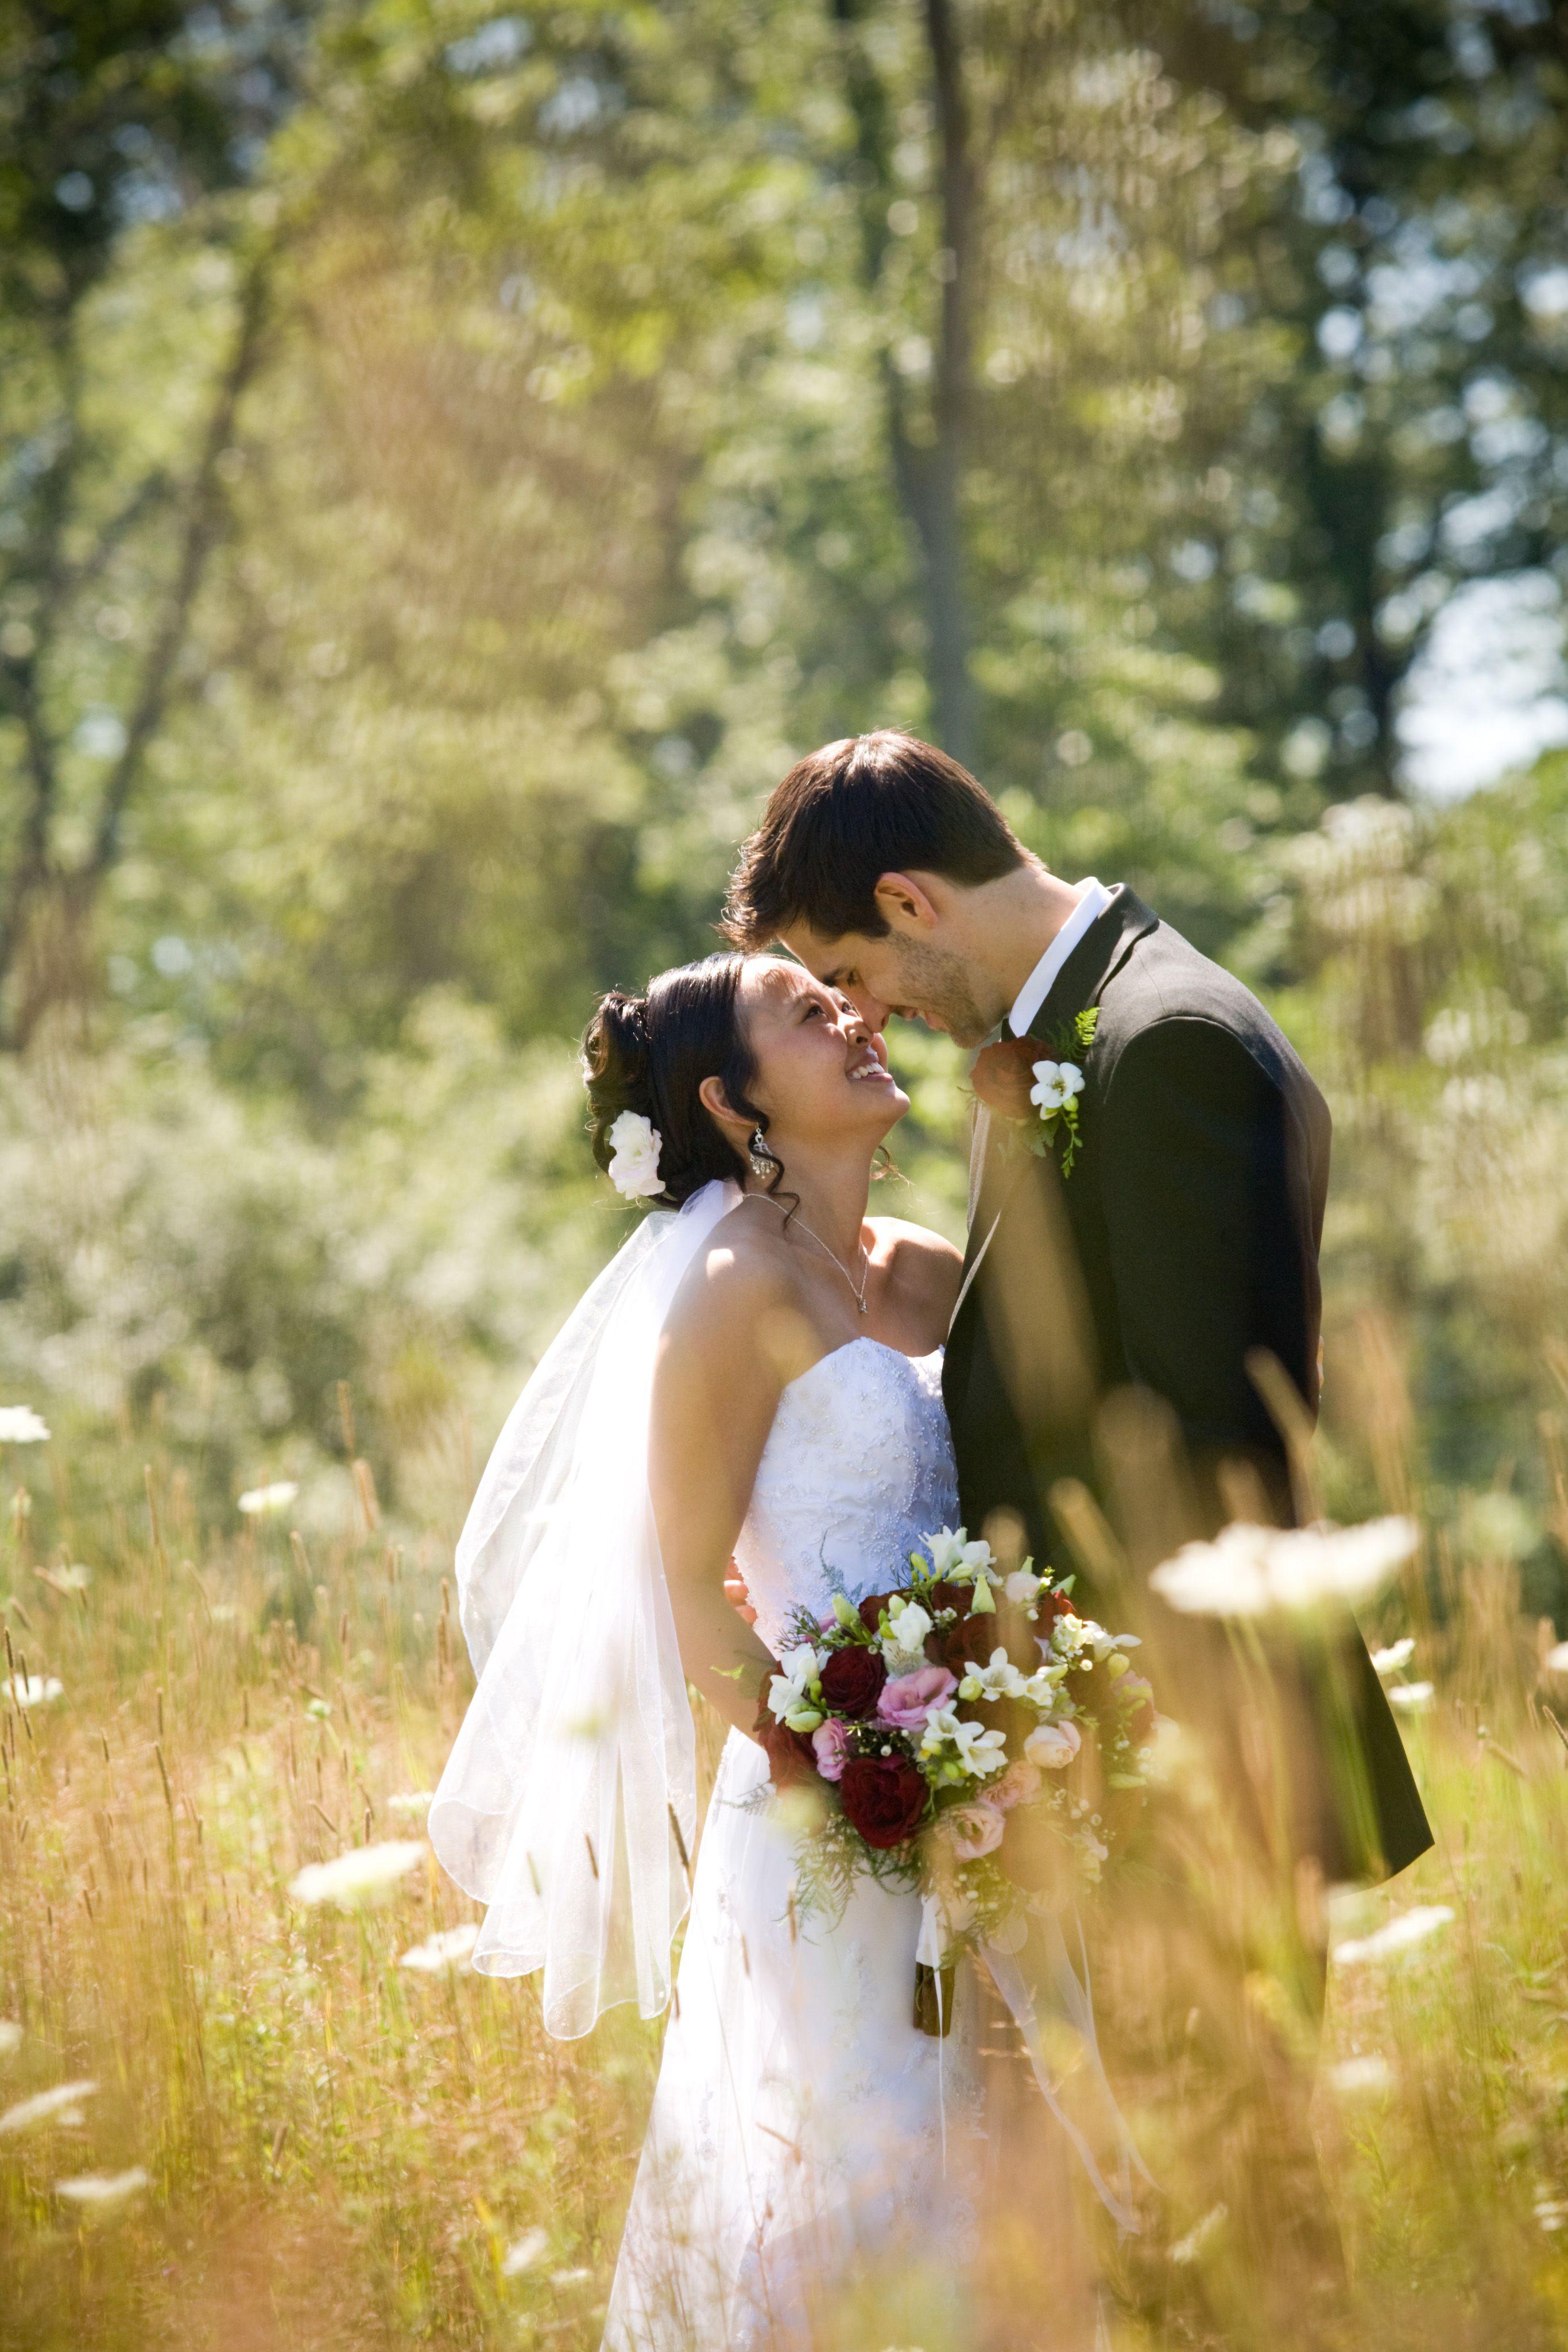 outdoor wedding couple pose maternity posing pinterest